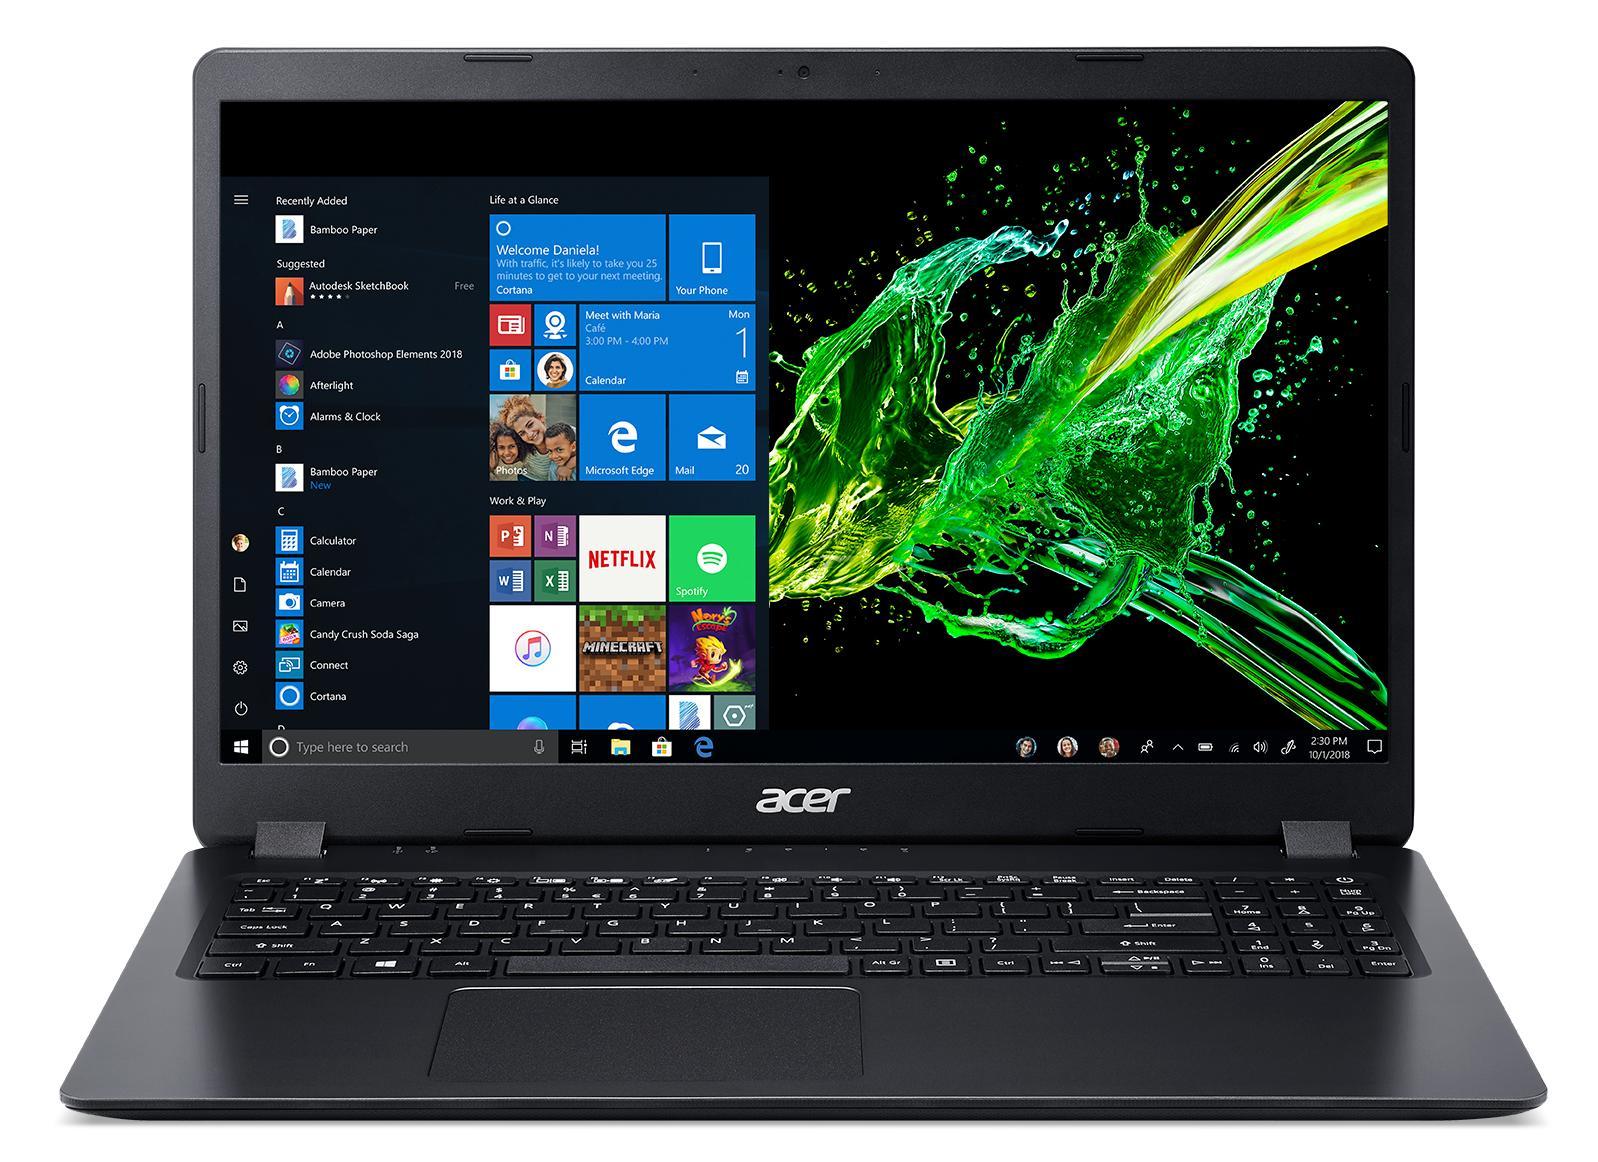 "Acer Aspire 3 (A315-42-R131) Ryzen 5 3500U/8GB/256GB SSD/15.6"" matný/Radeon Vega 8/W10 Home/Black"